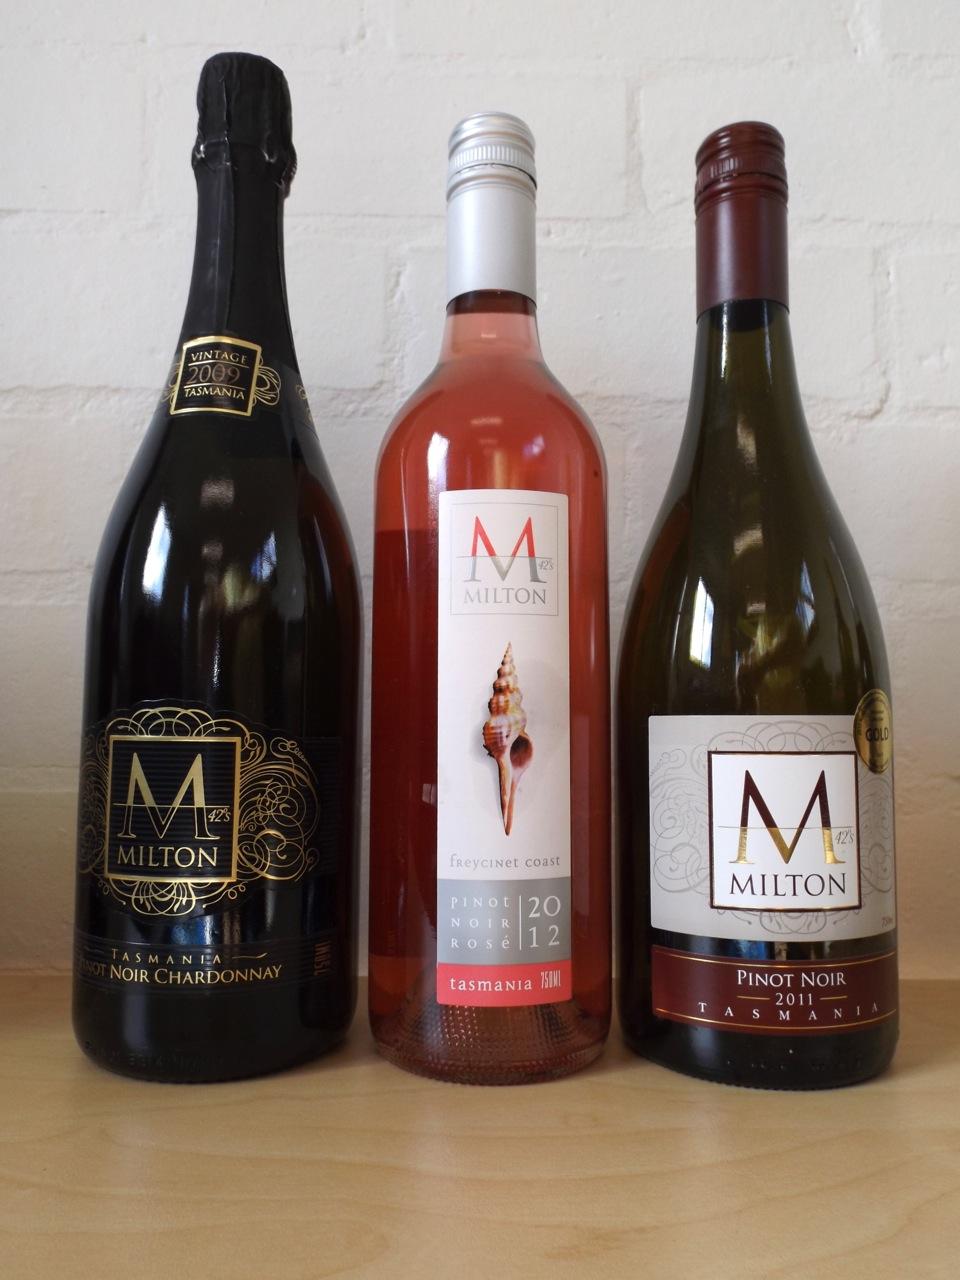 MILTON - Brand design, illustration, wine label design and stationery design.